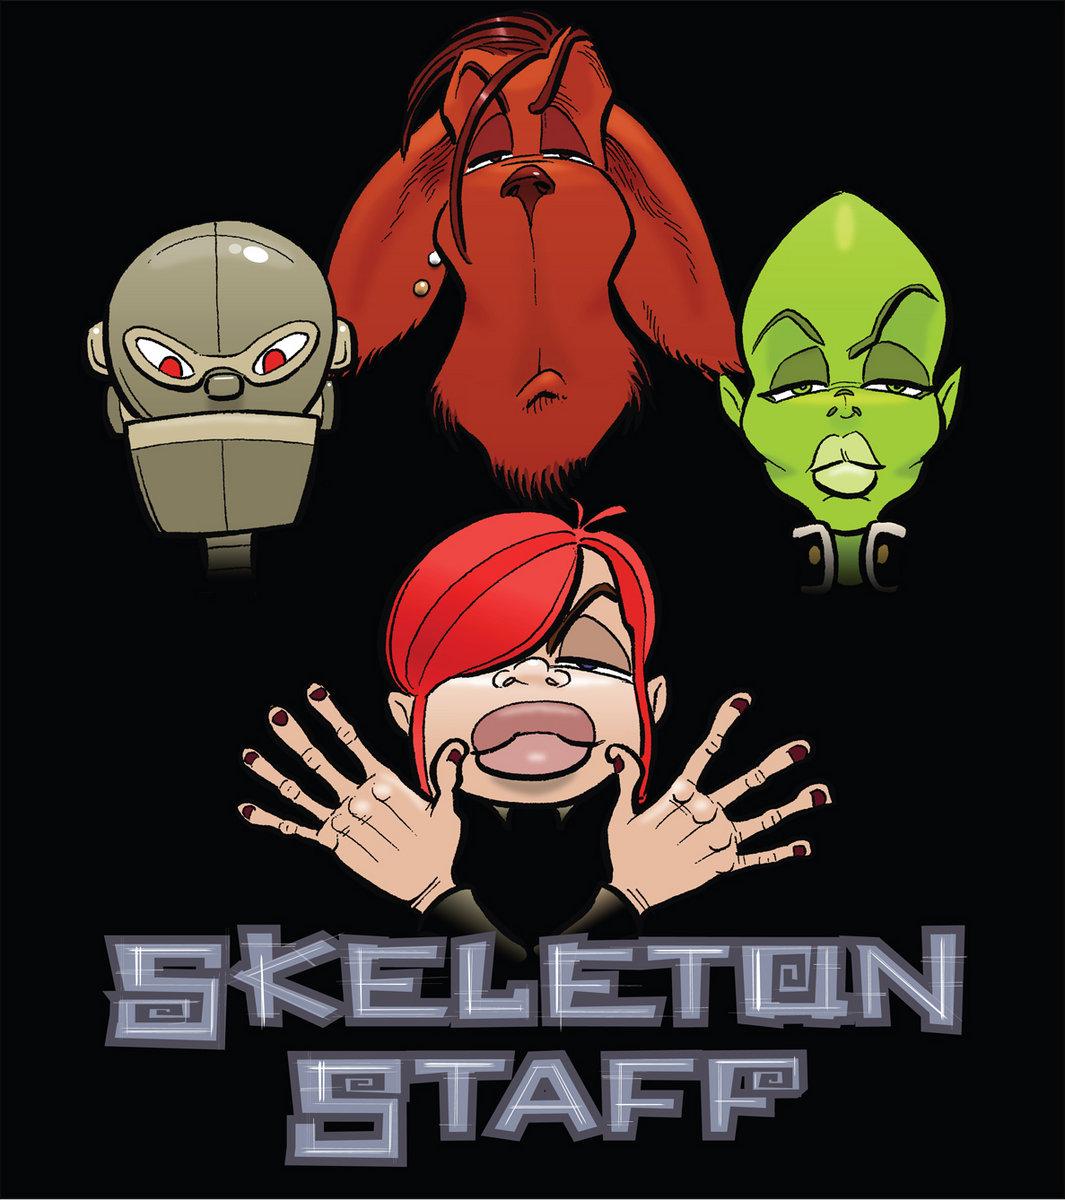 Music Skeleton Staff